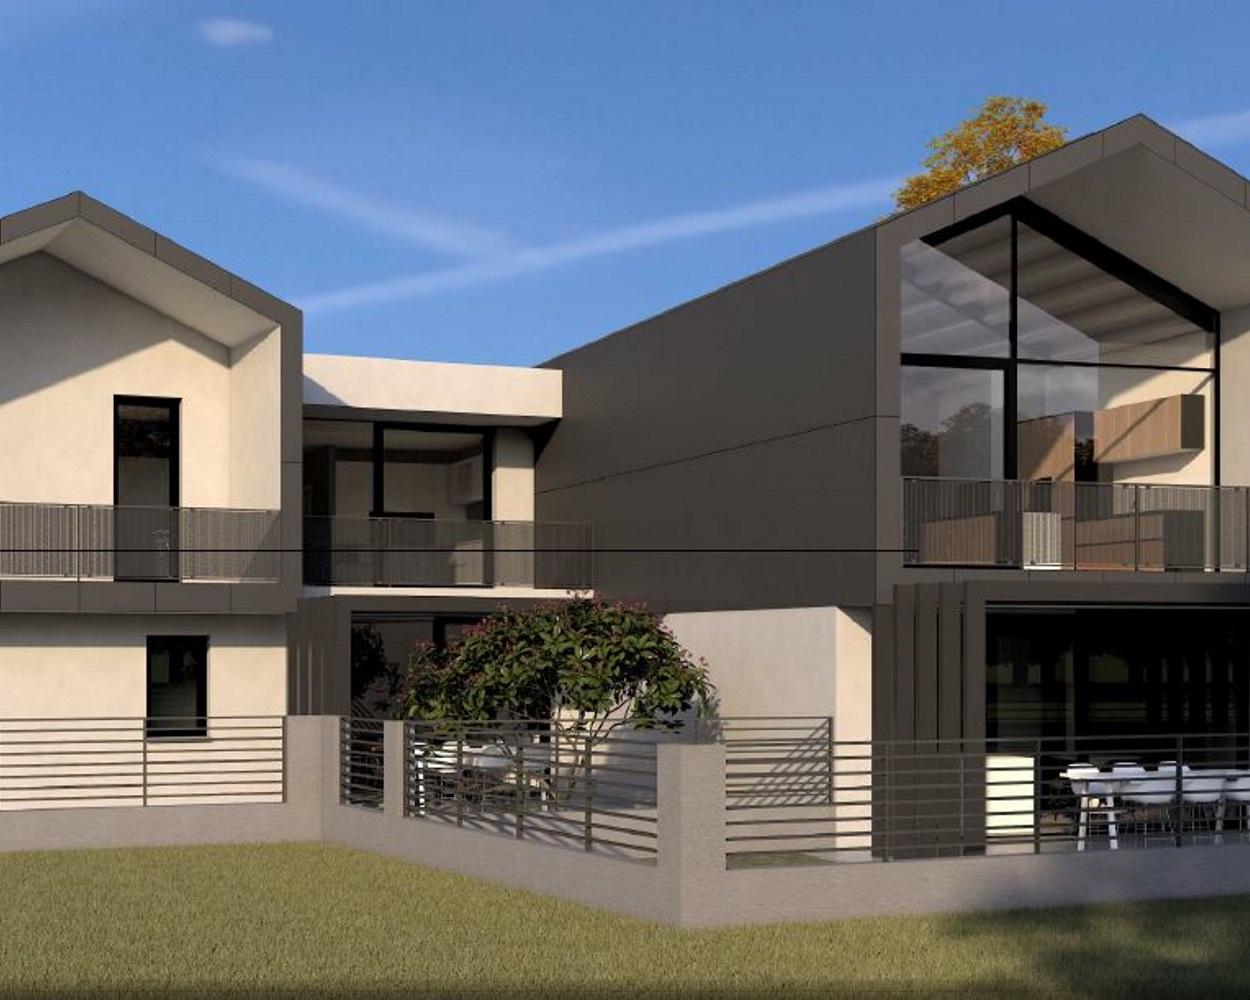 Vendita case residenziali caldogno vicenza for Case in vendita vicenza